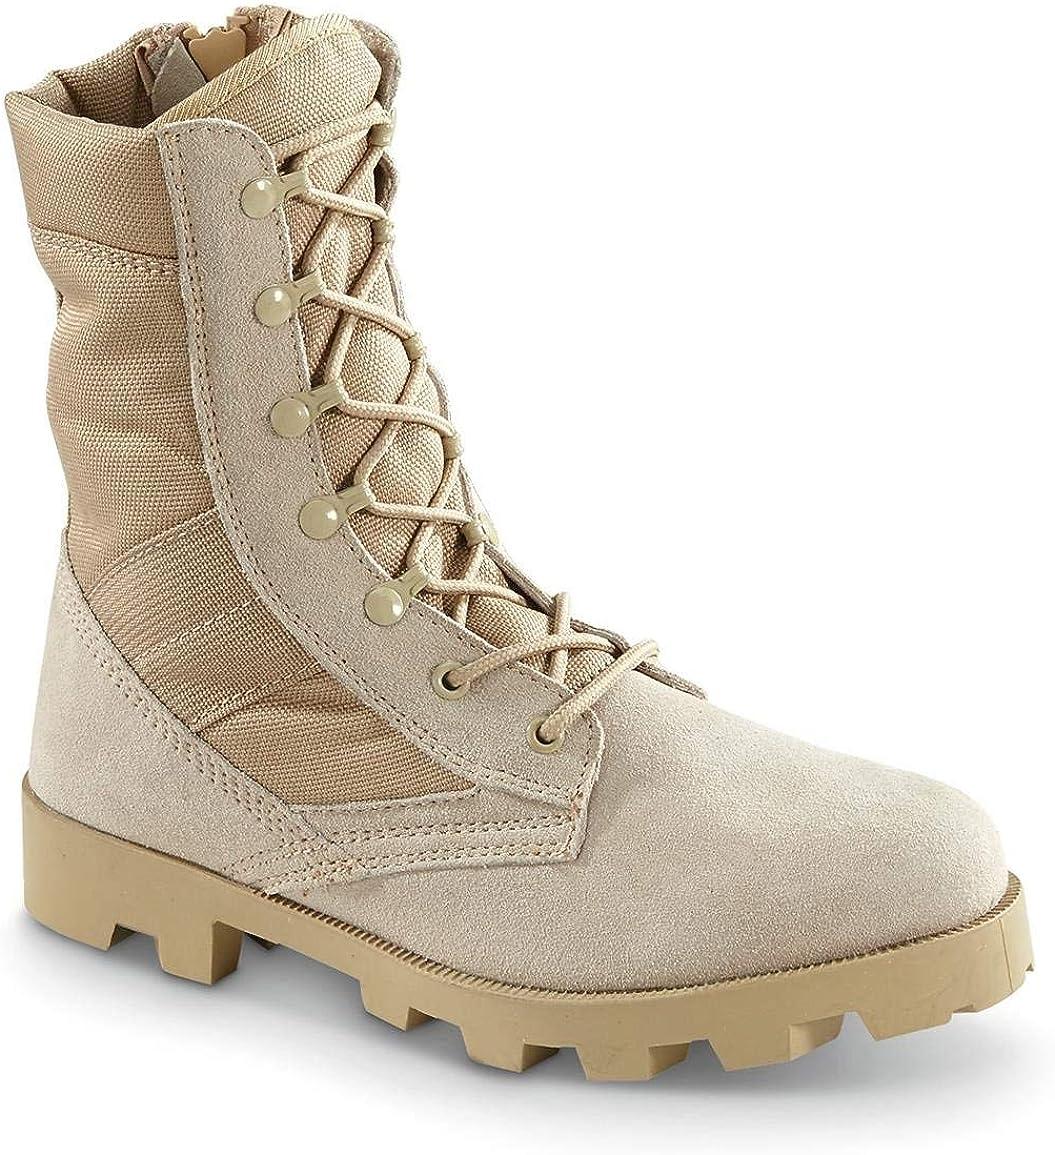 Selling Blackrock Men's Side Zip Max 51% OFF Boots Jungle